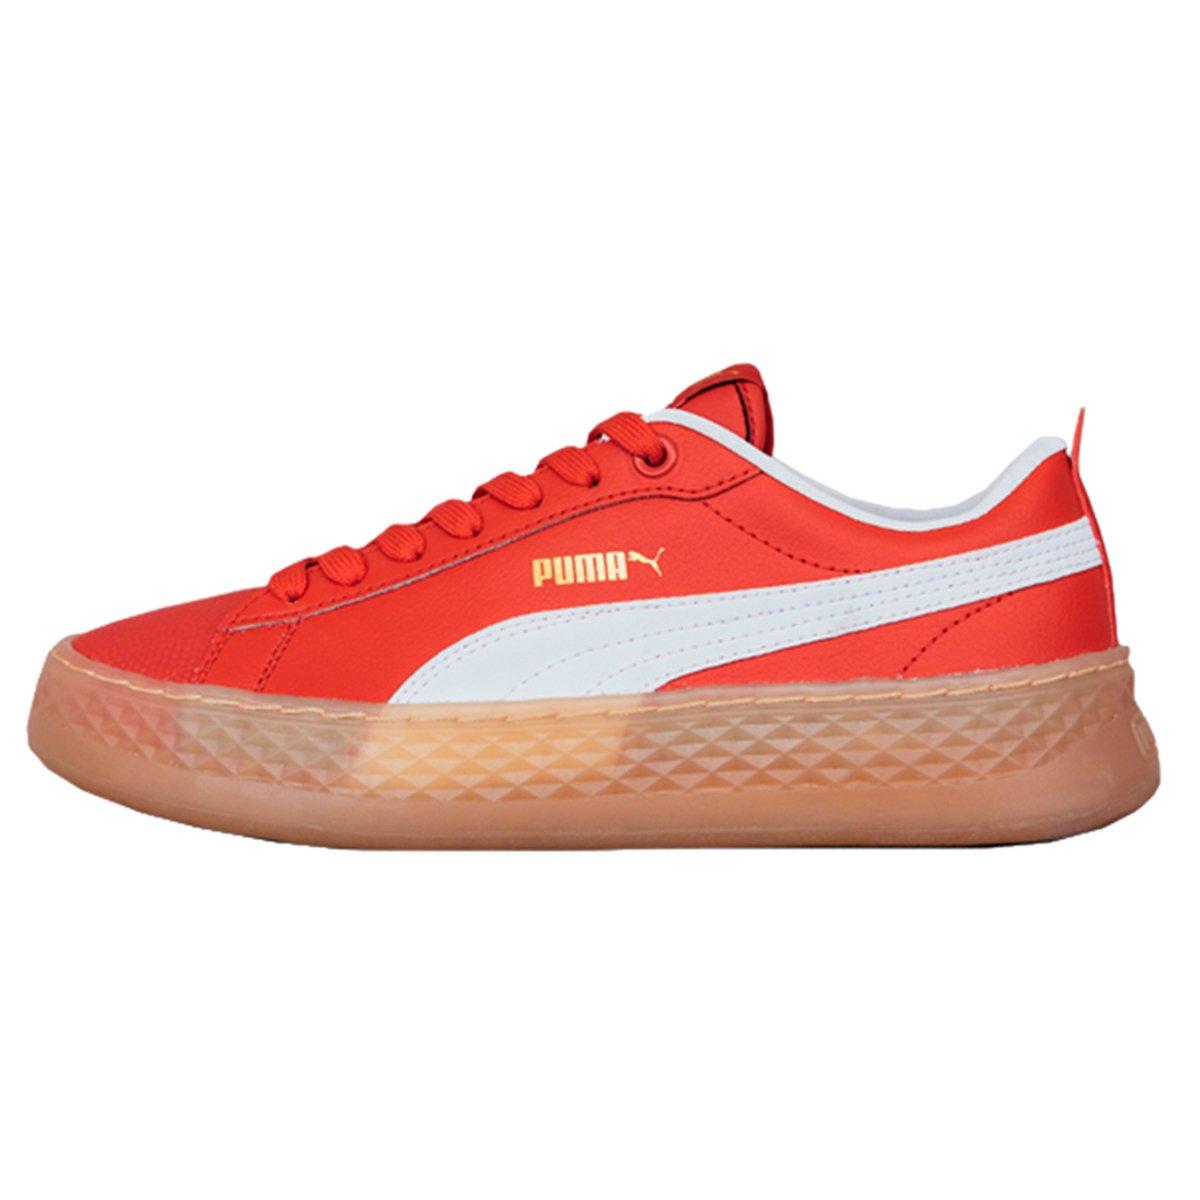 tenis puma vermelho feminino